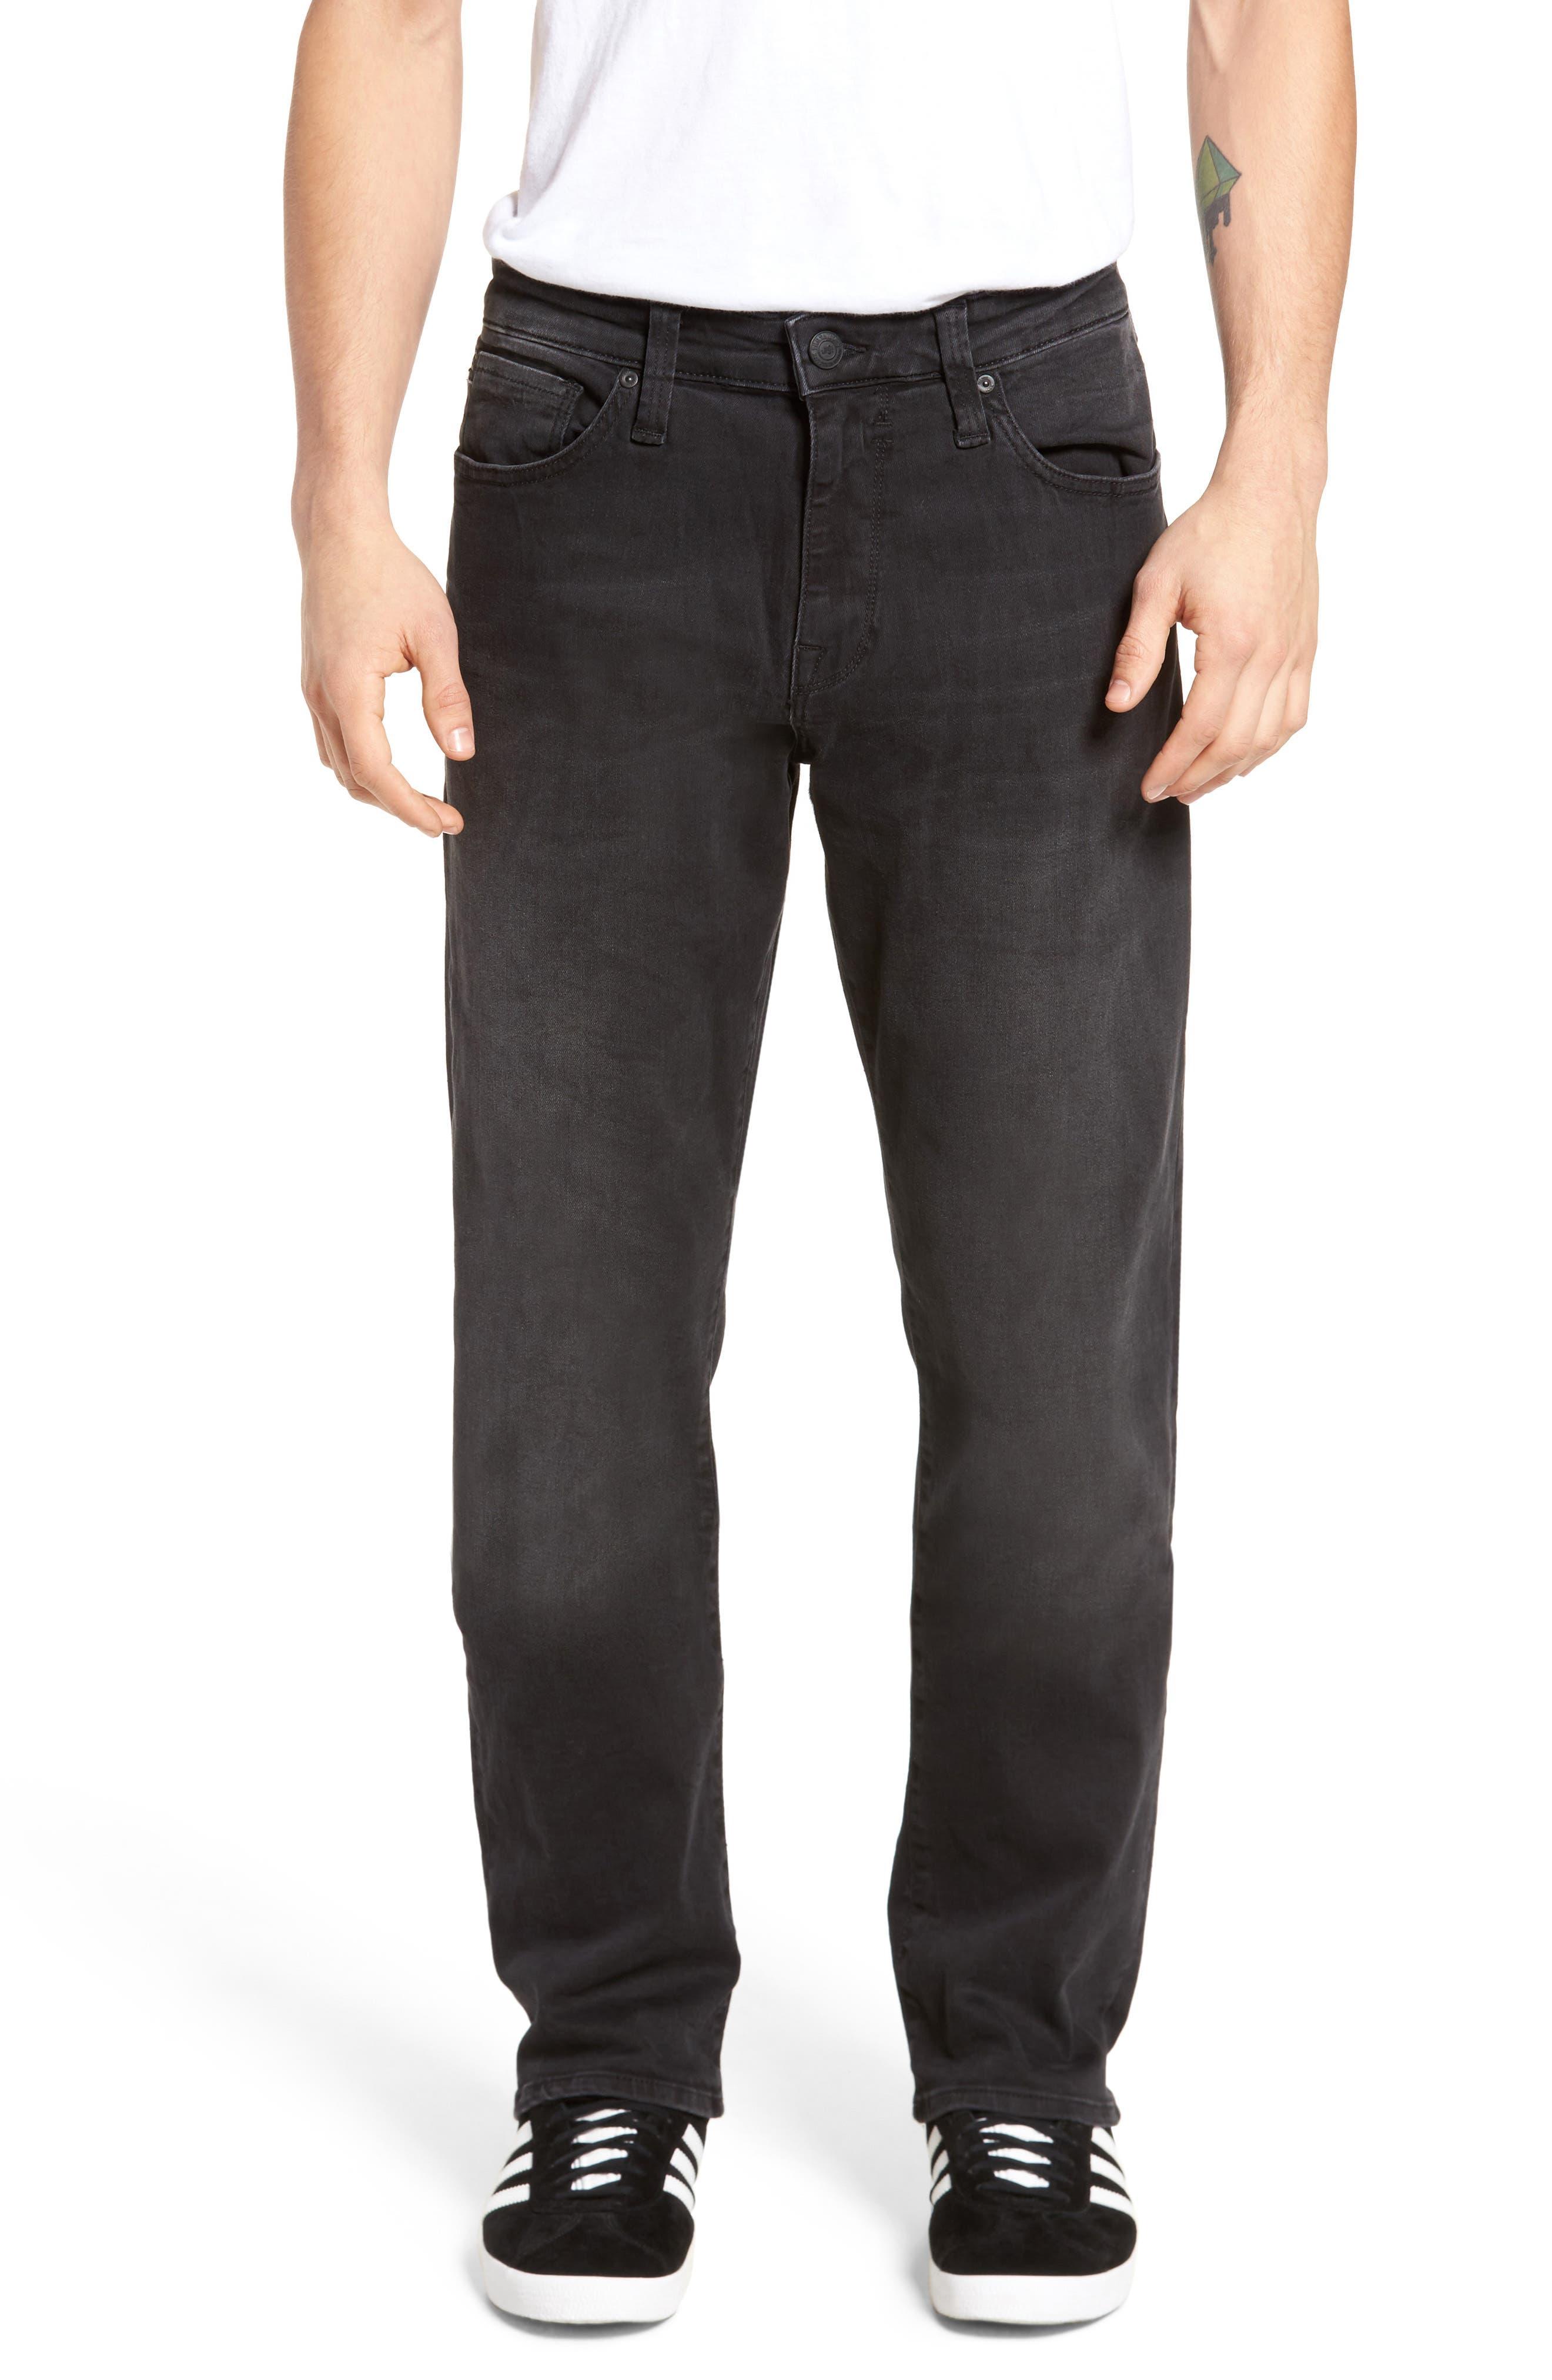 Mavi Jeans Myles Straight Fit Jeans (Smoke Chelsea)